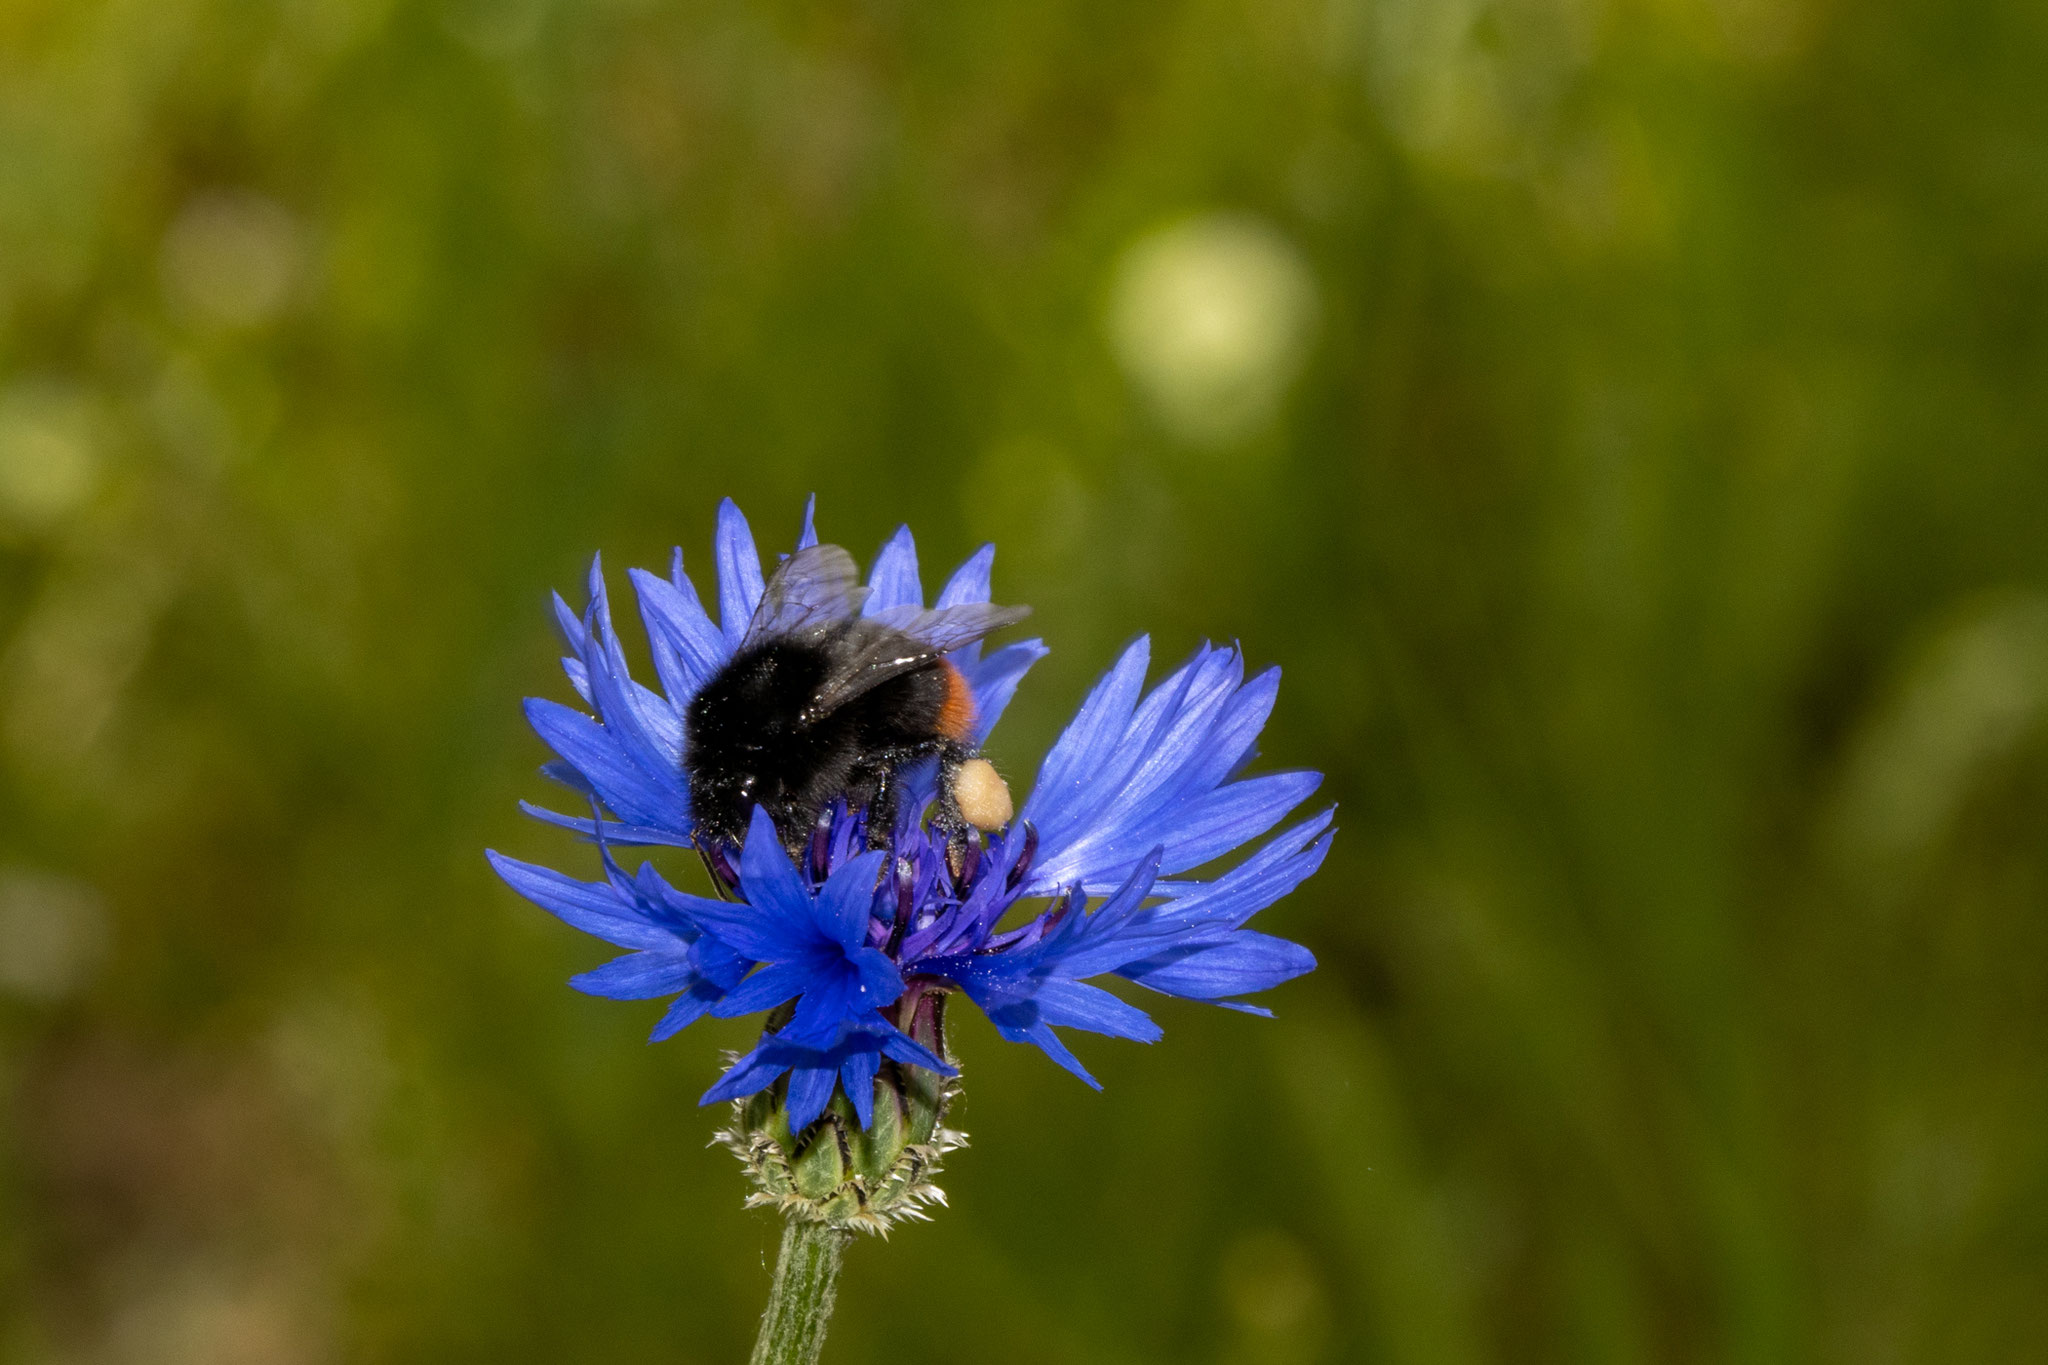 Steinhhummel [Bombus lapidarius] mit Pollenpaket am Bein (Foto: B. Budig)